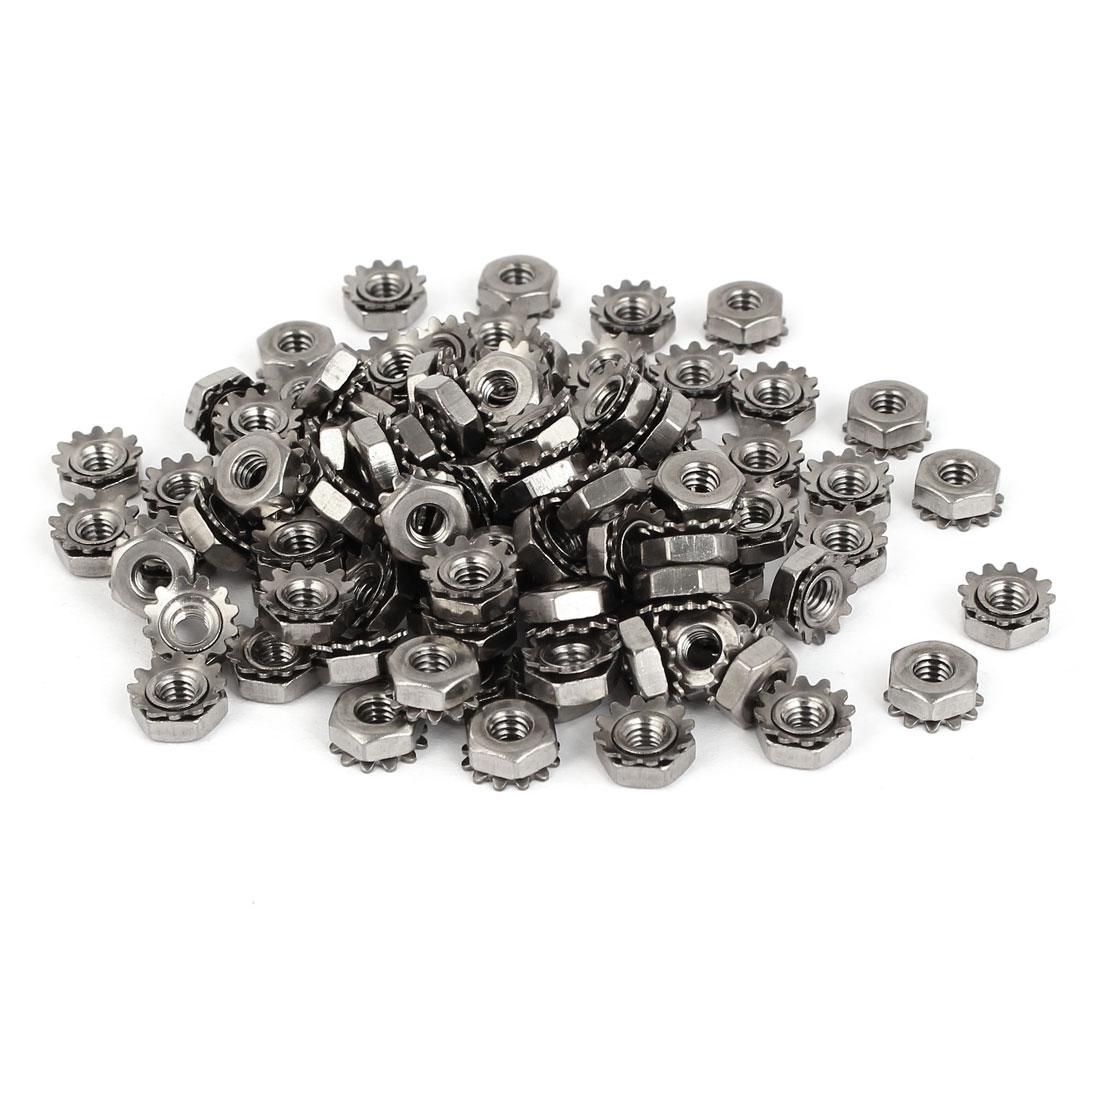 8#-32 304 Stainless Steel Female Thread Kep Hex Head Lock Nut 100pcs